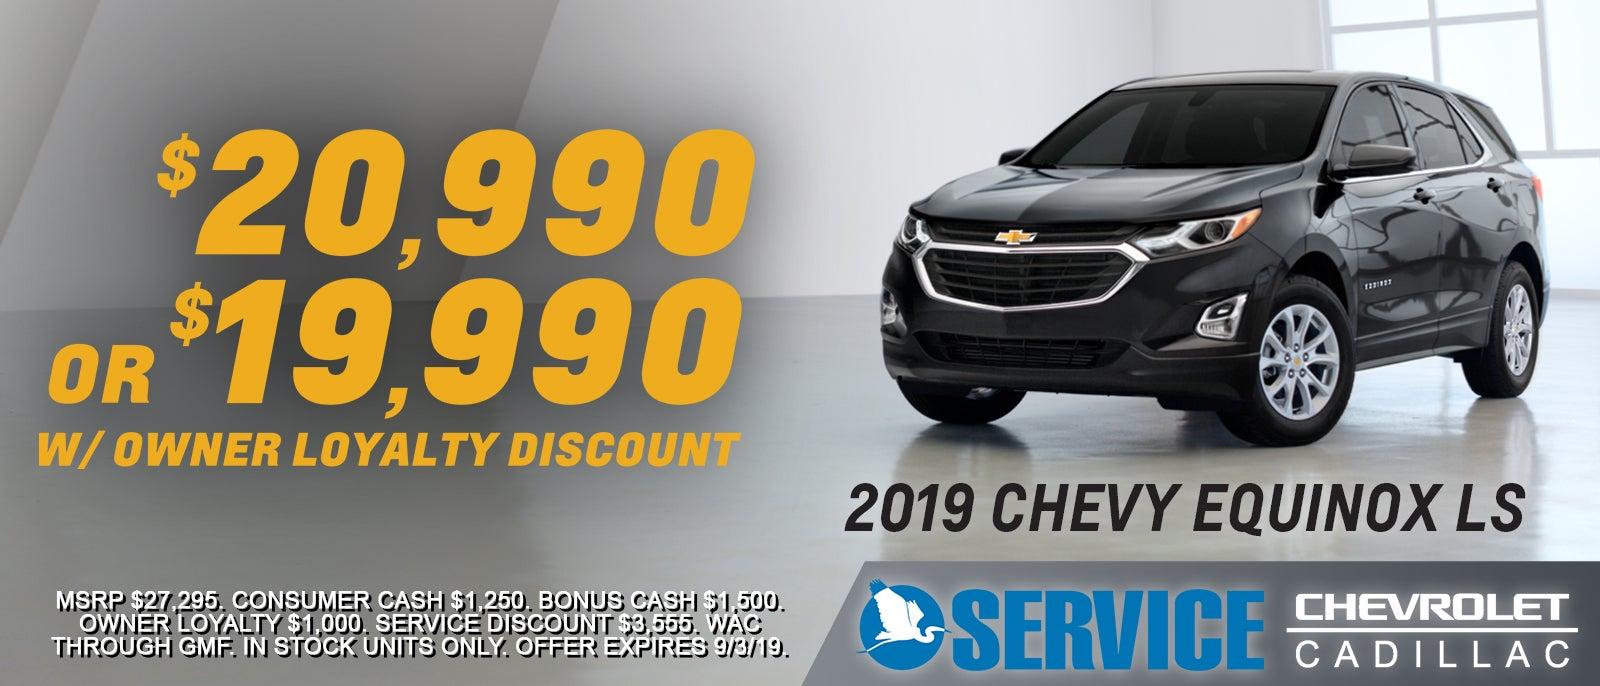 Chevrolet & Cadillac for Sale Lafayette, LA   Service Chevrolet Cadillac